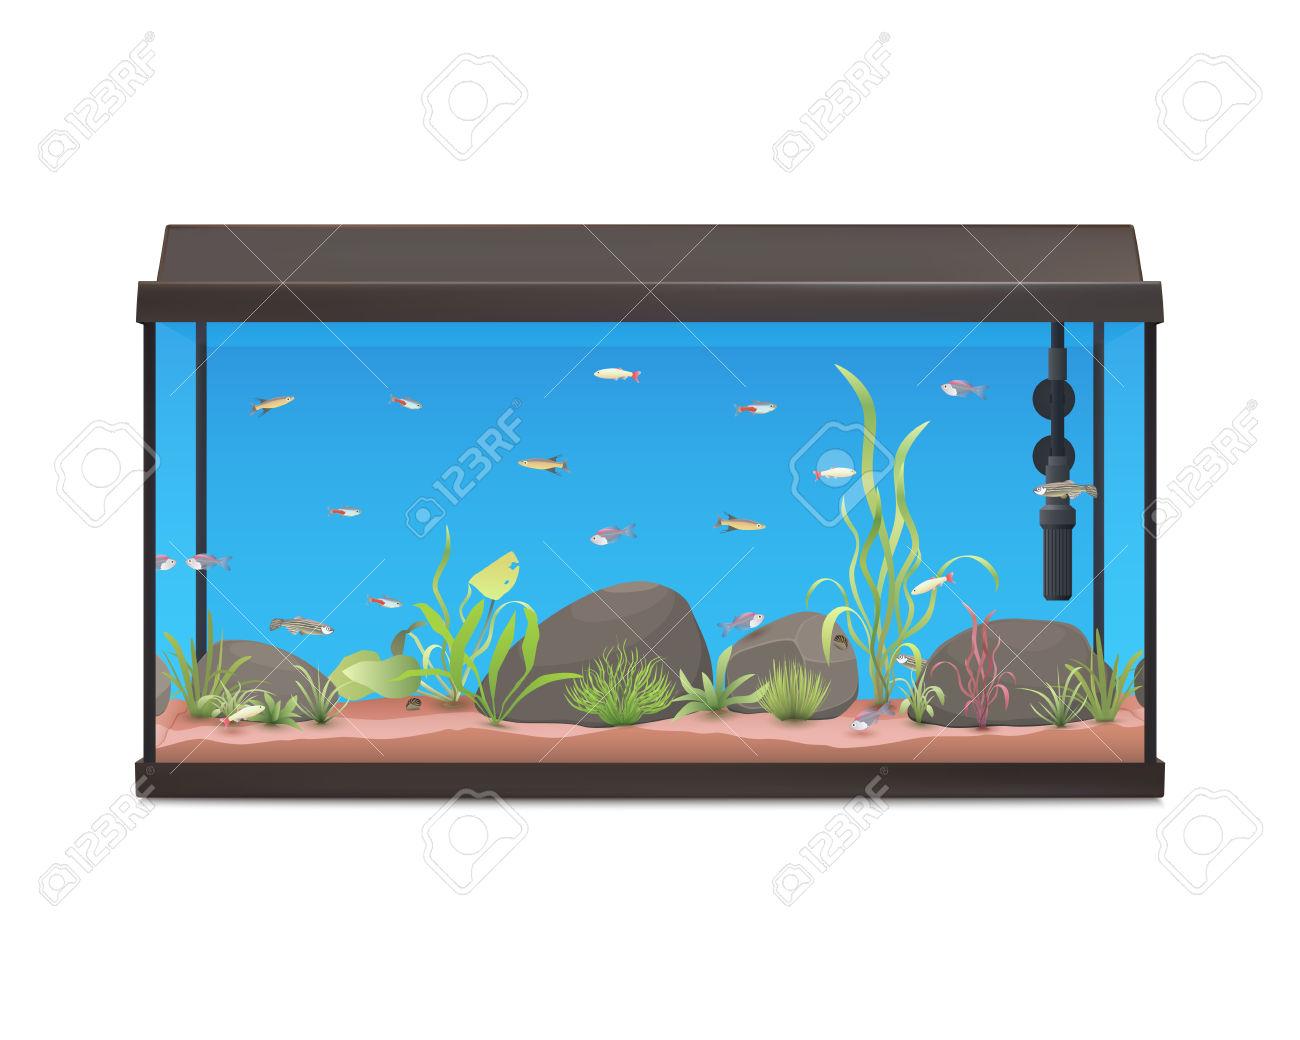 Fishtank clipart #1, Download drawings